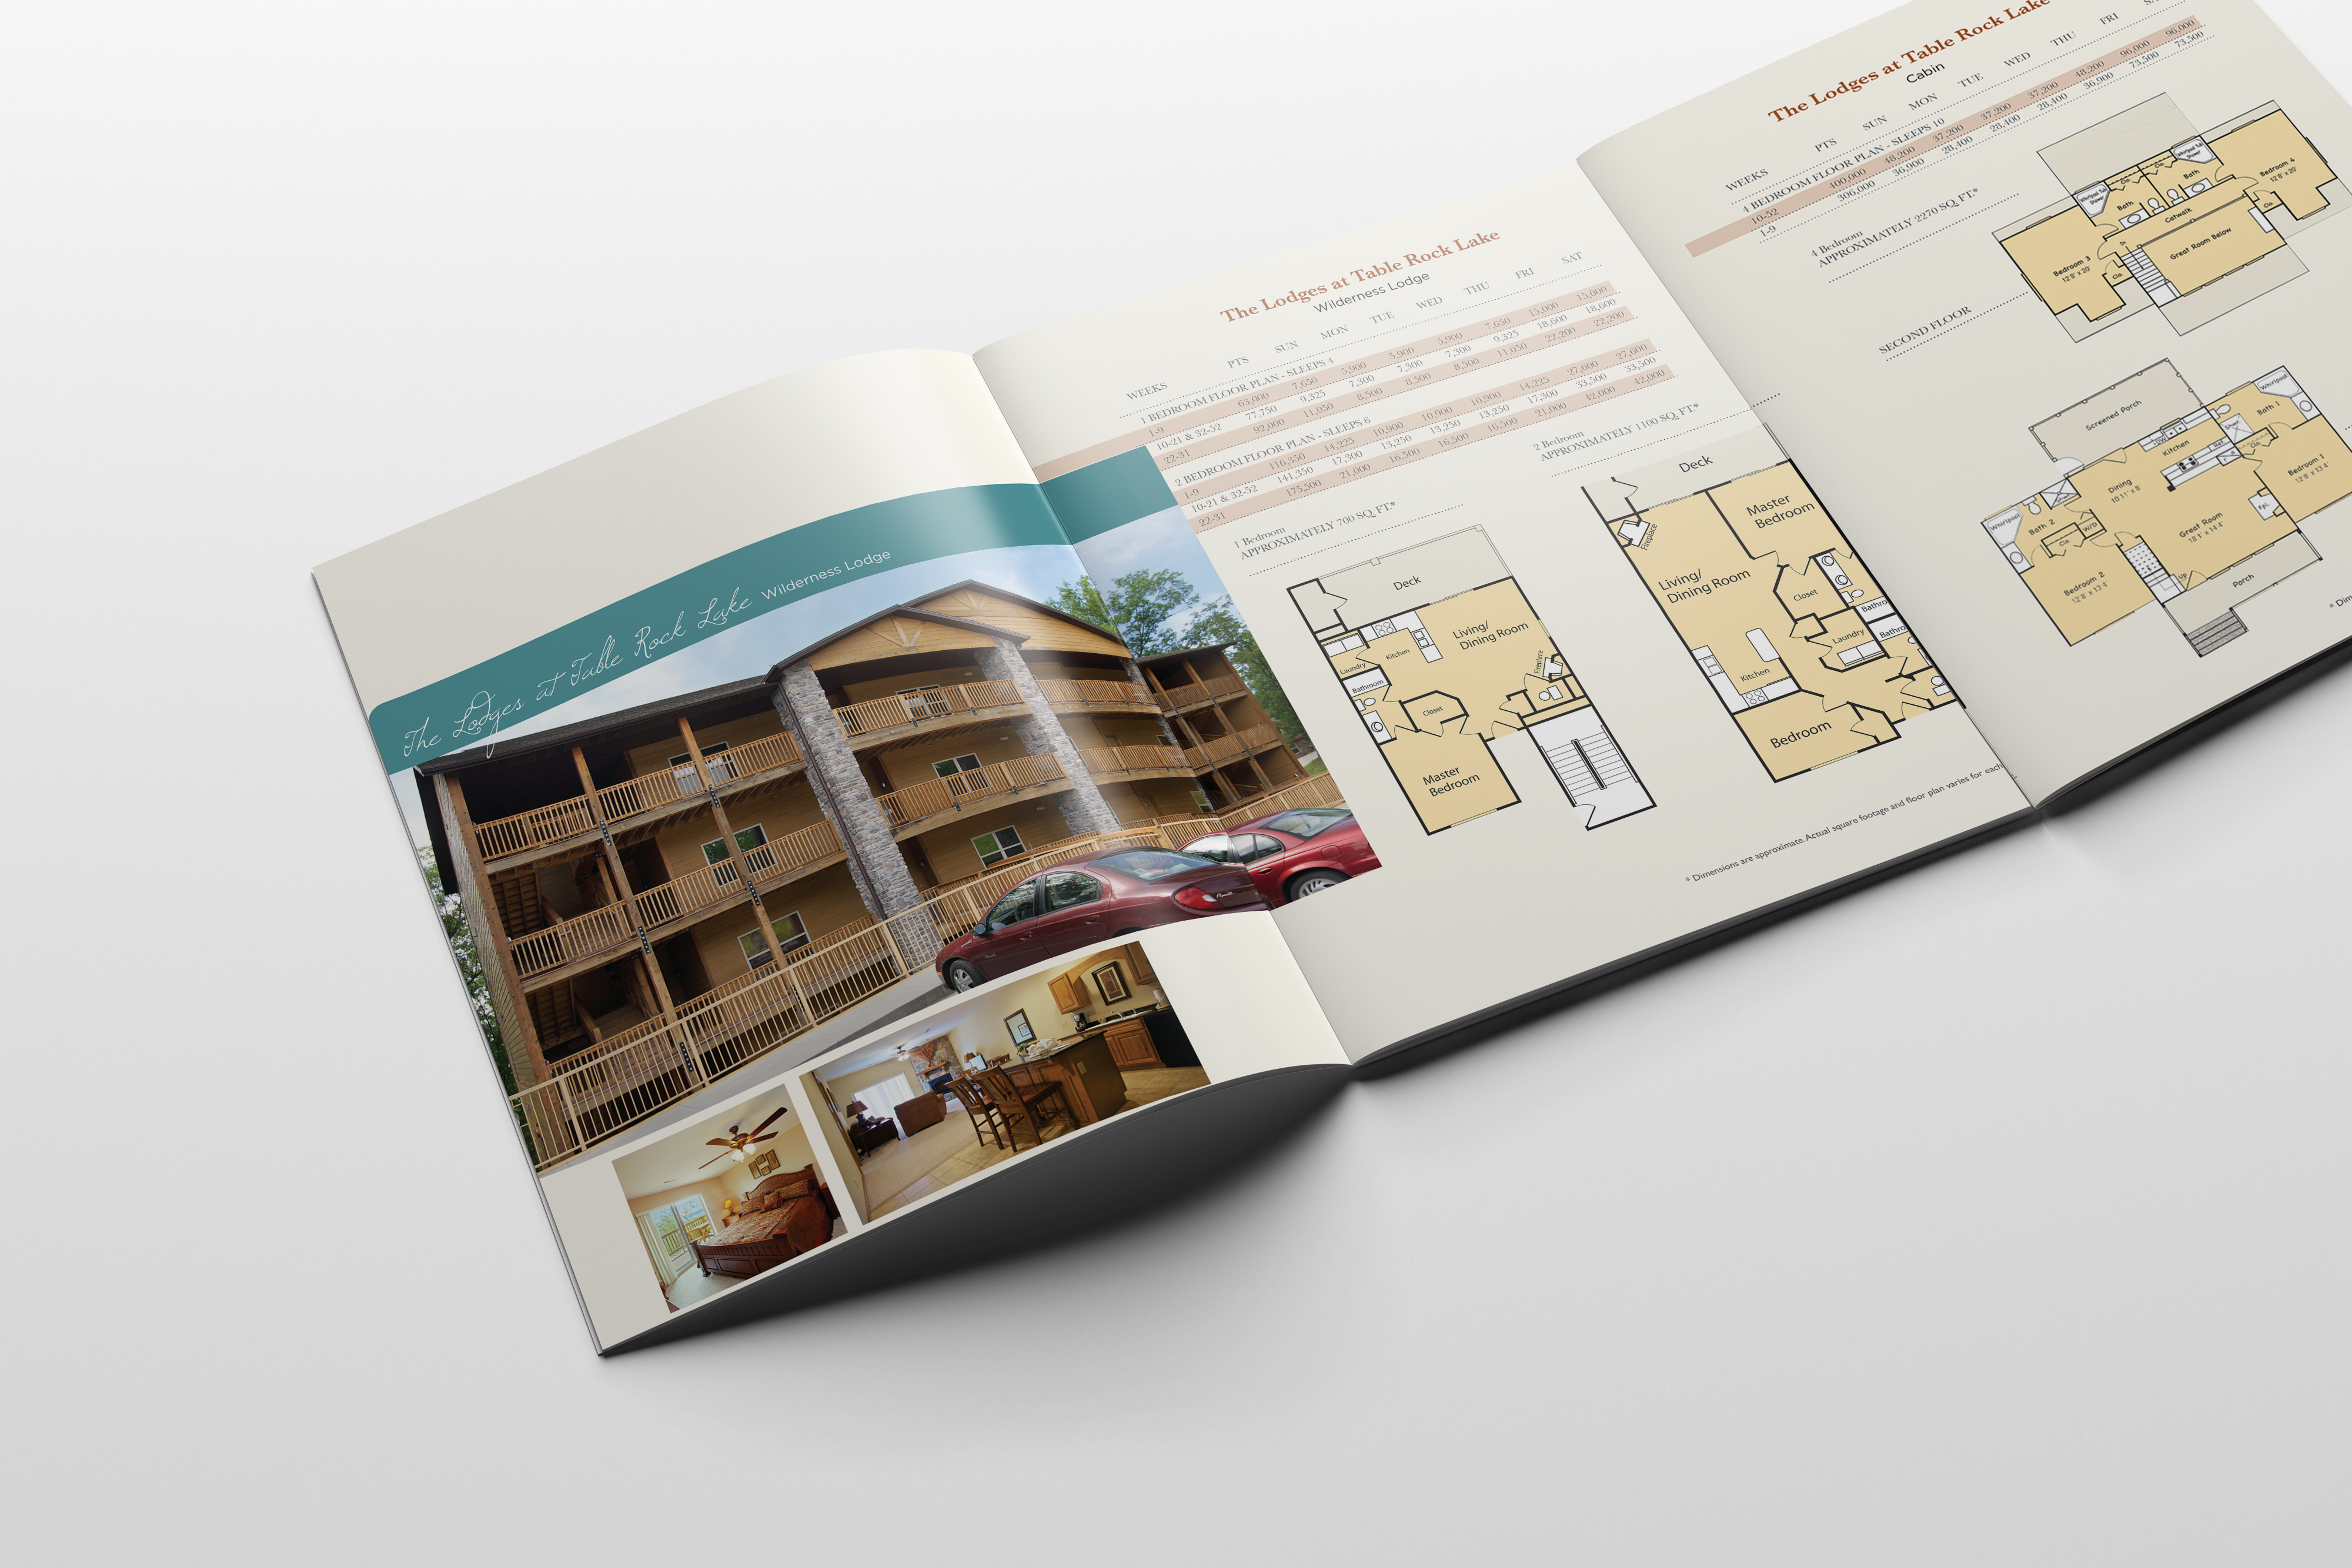 Capital Resorts publication inside foldout